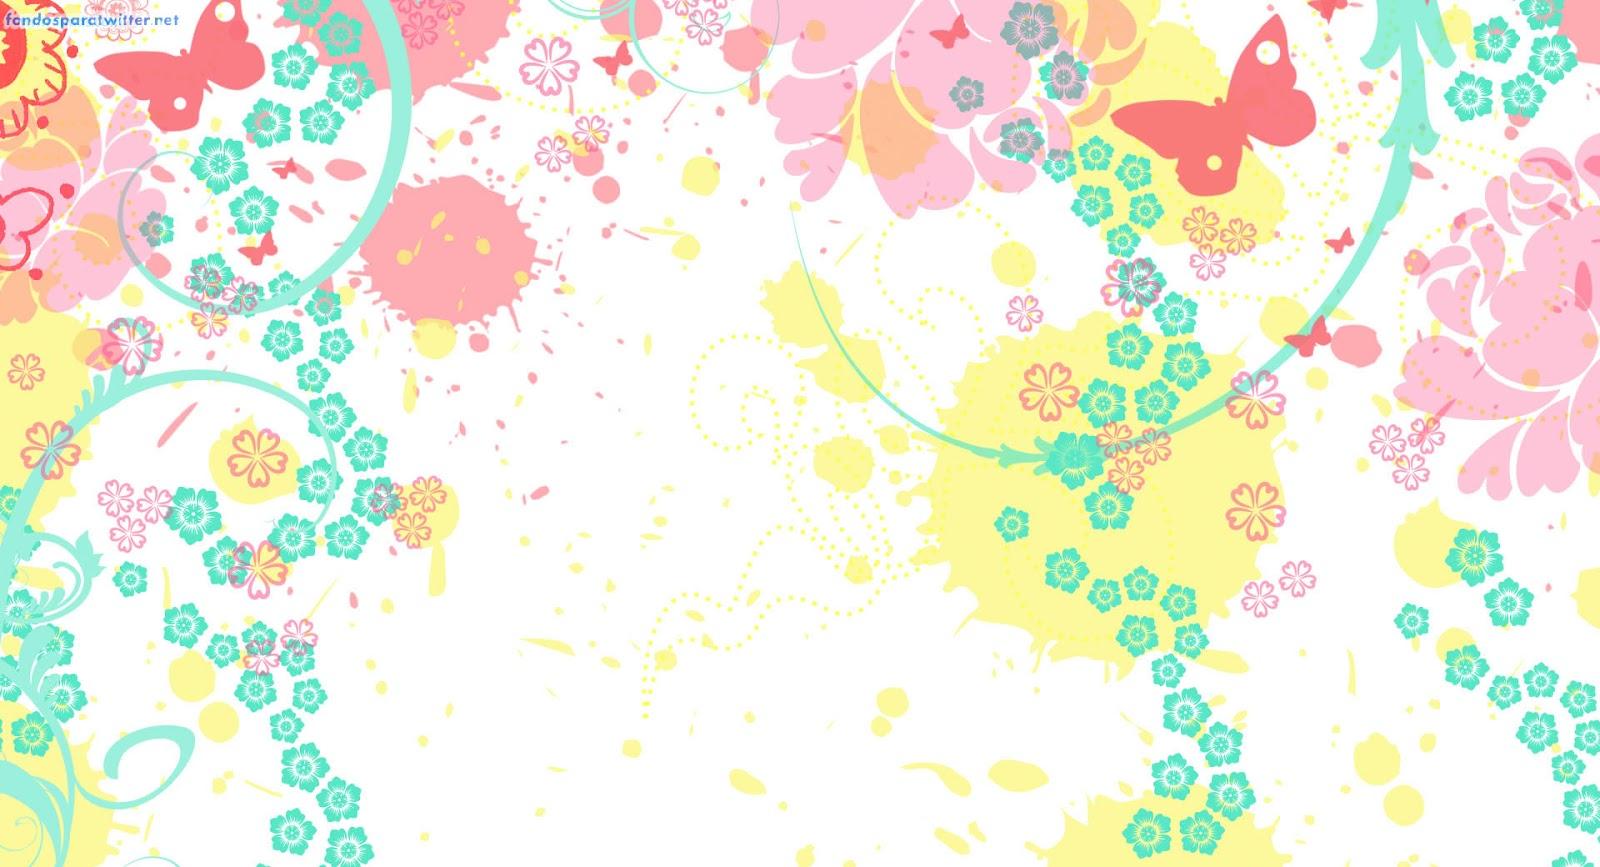 De Twitter 300x162 Fondos Para Twitter HD Walls Find Wallpapers 1600x867